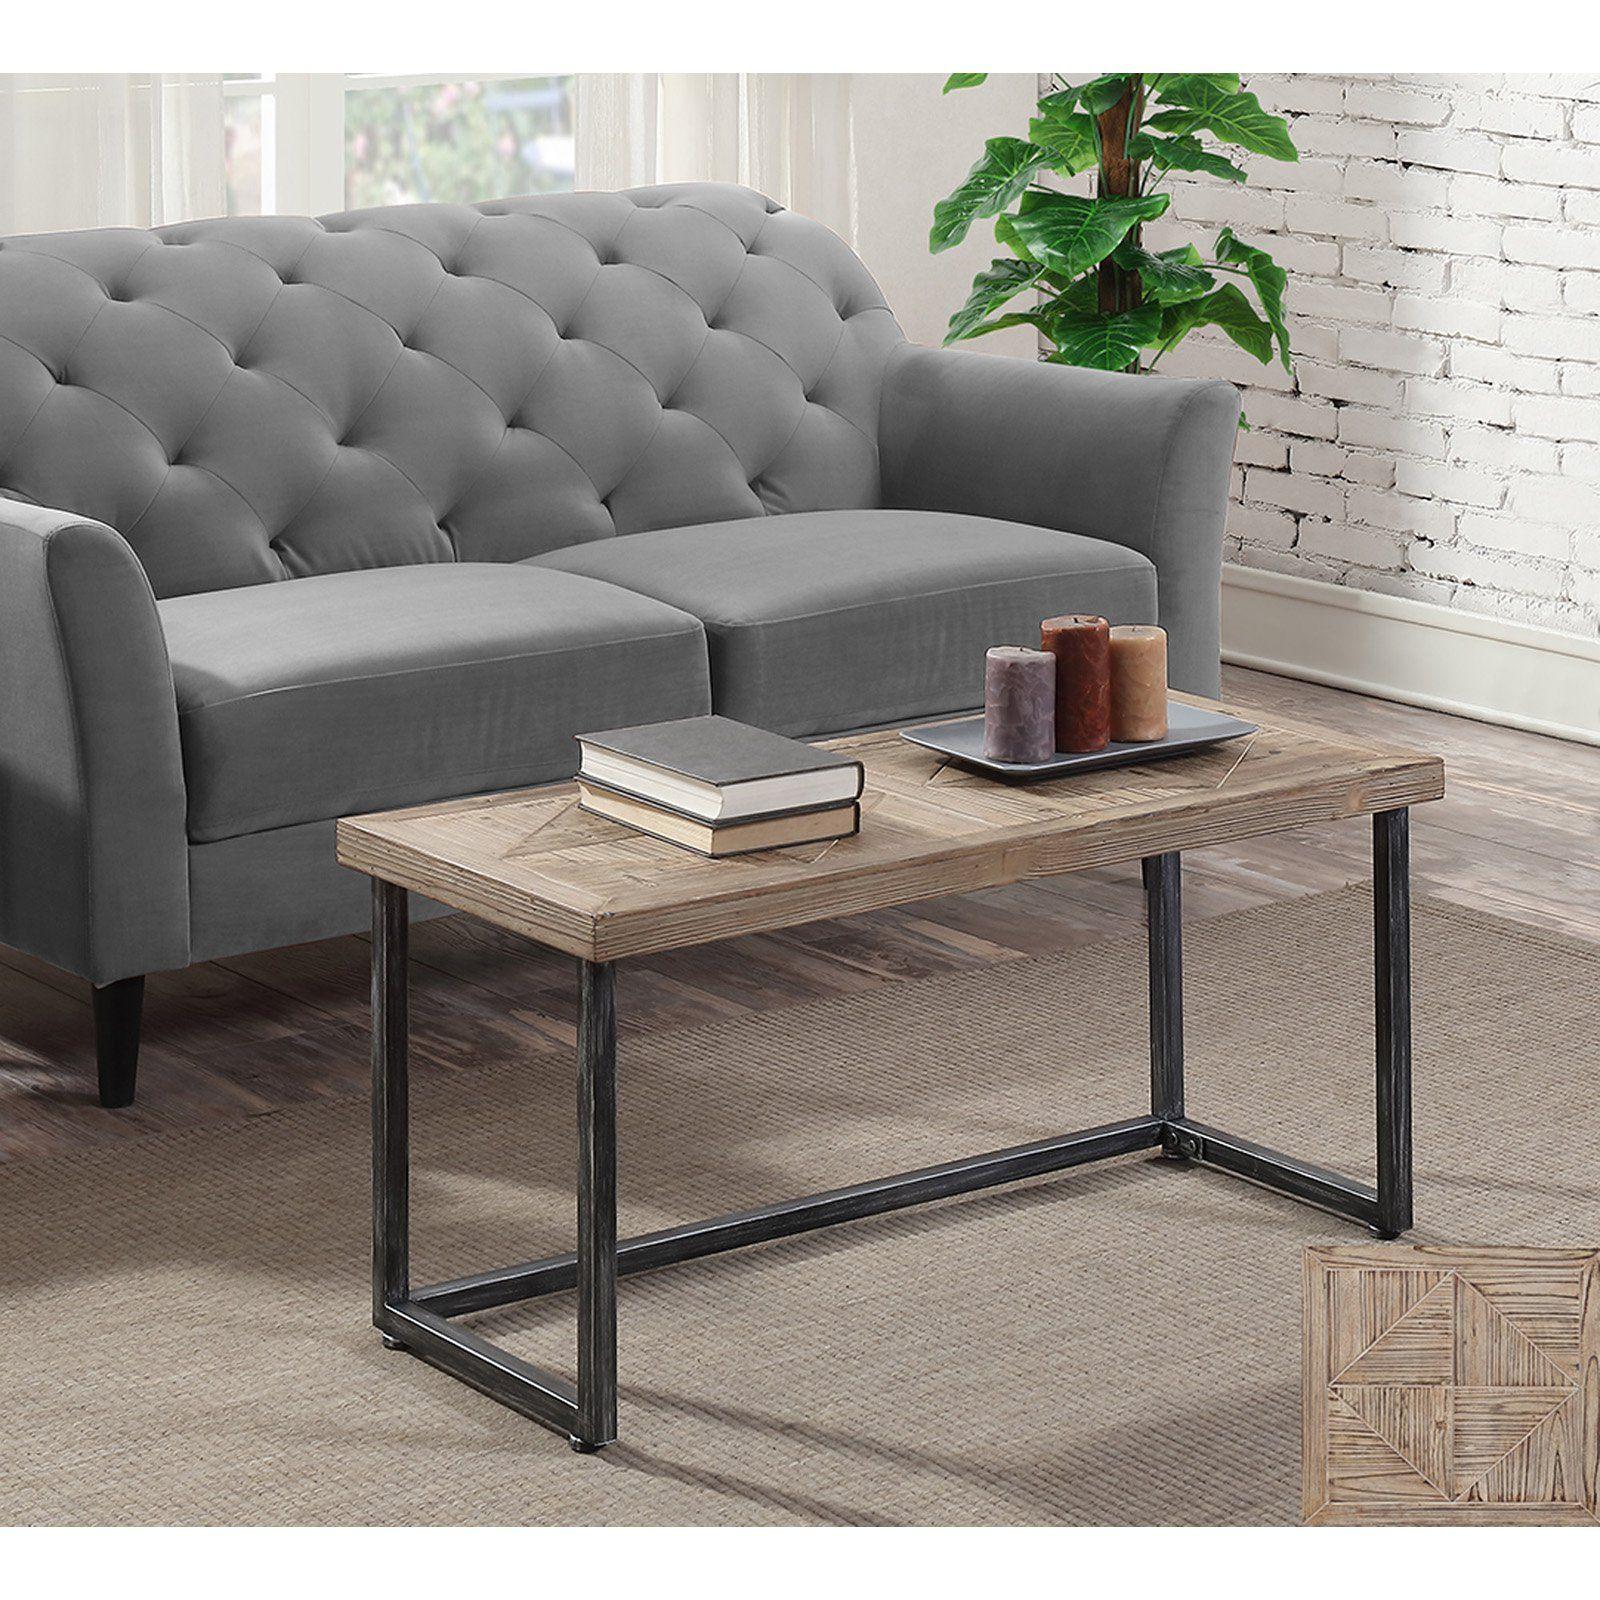 Convenience concepts laredo parquet coffee table coffee